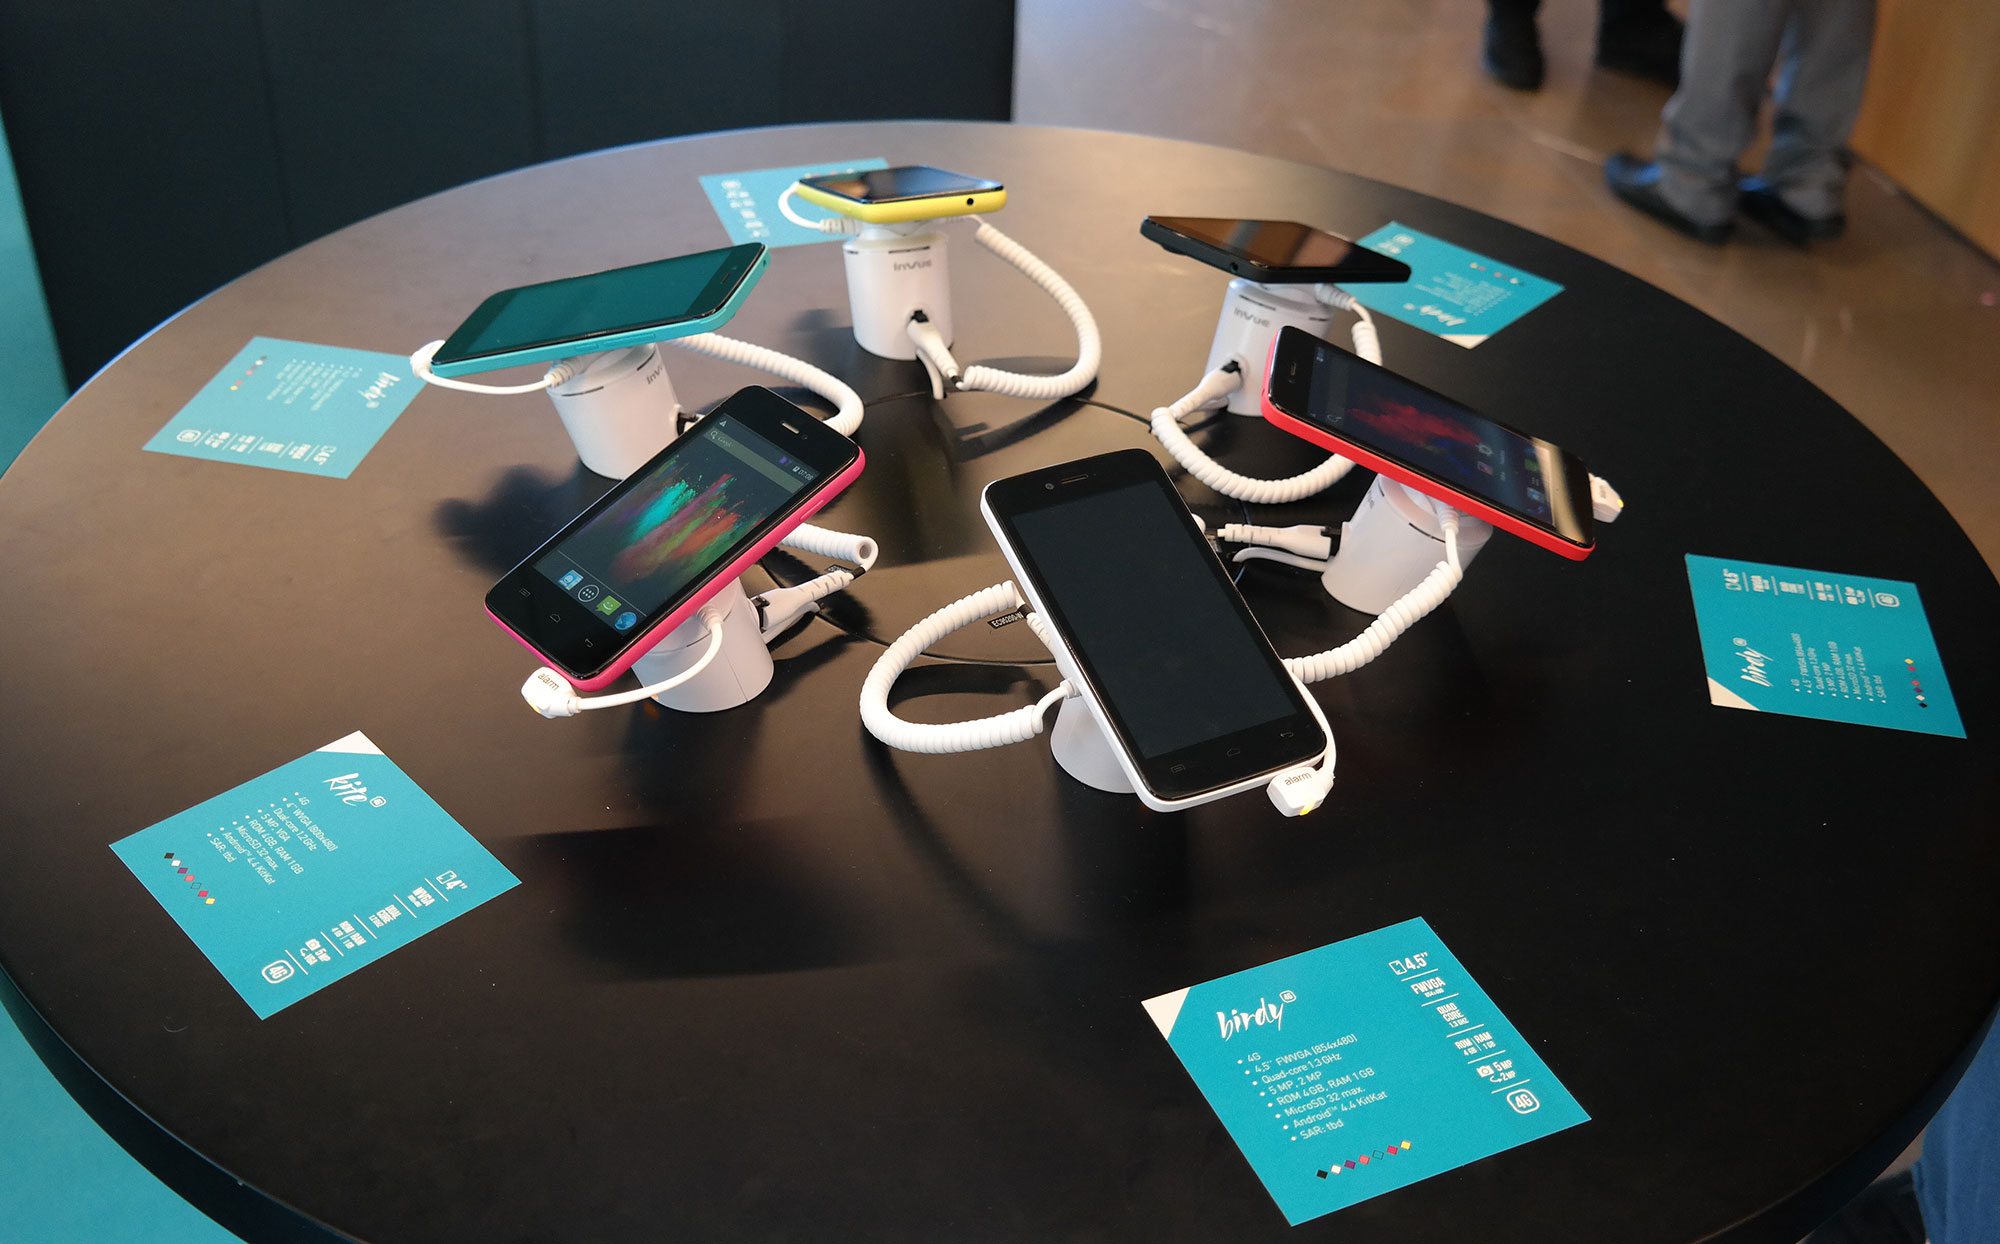 comparatif des meilleurs smartphones android du moment meilleur mobile. Black Bedroom Furniture Sets. Home Design Ideas